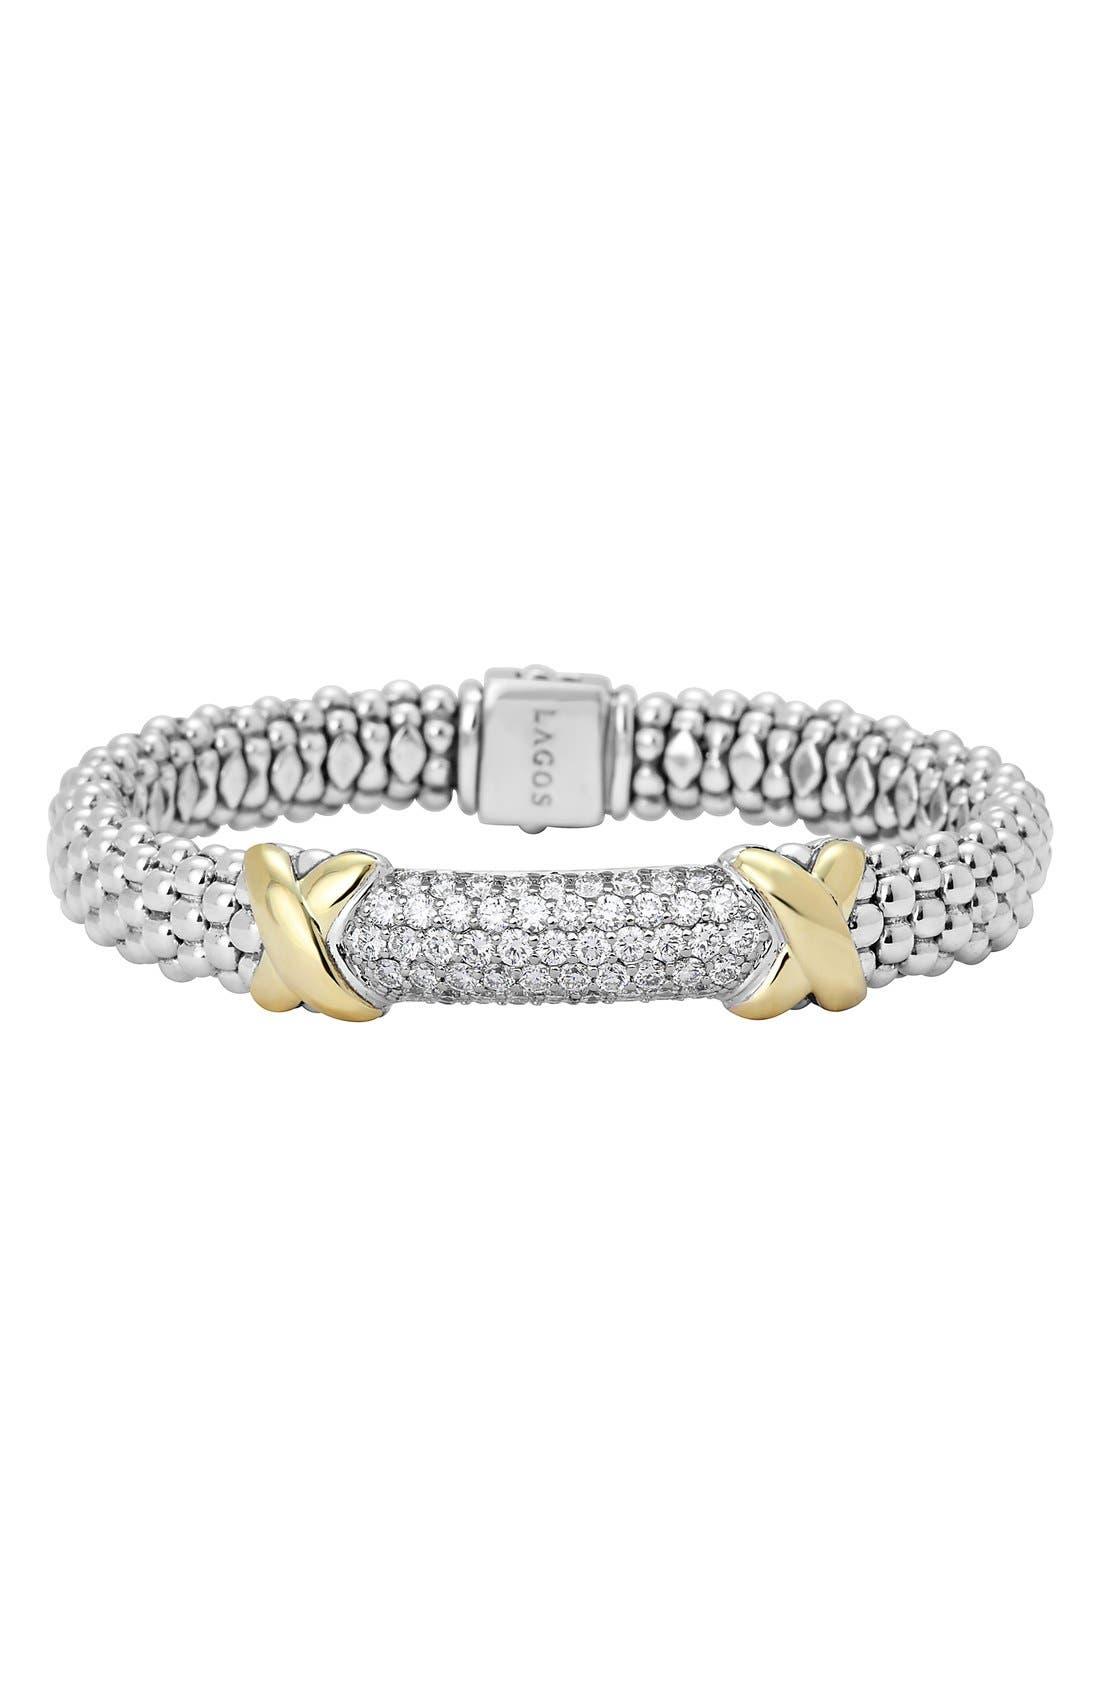 LAGOS 'Diamond Lux' Rope Bracelet